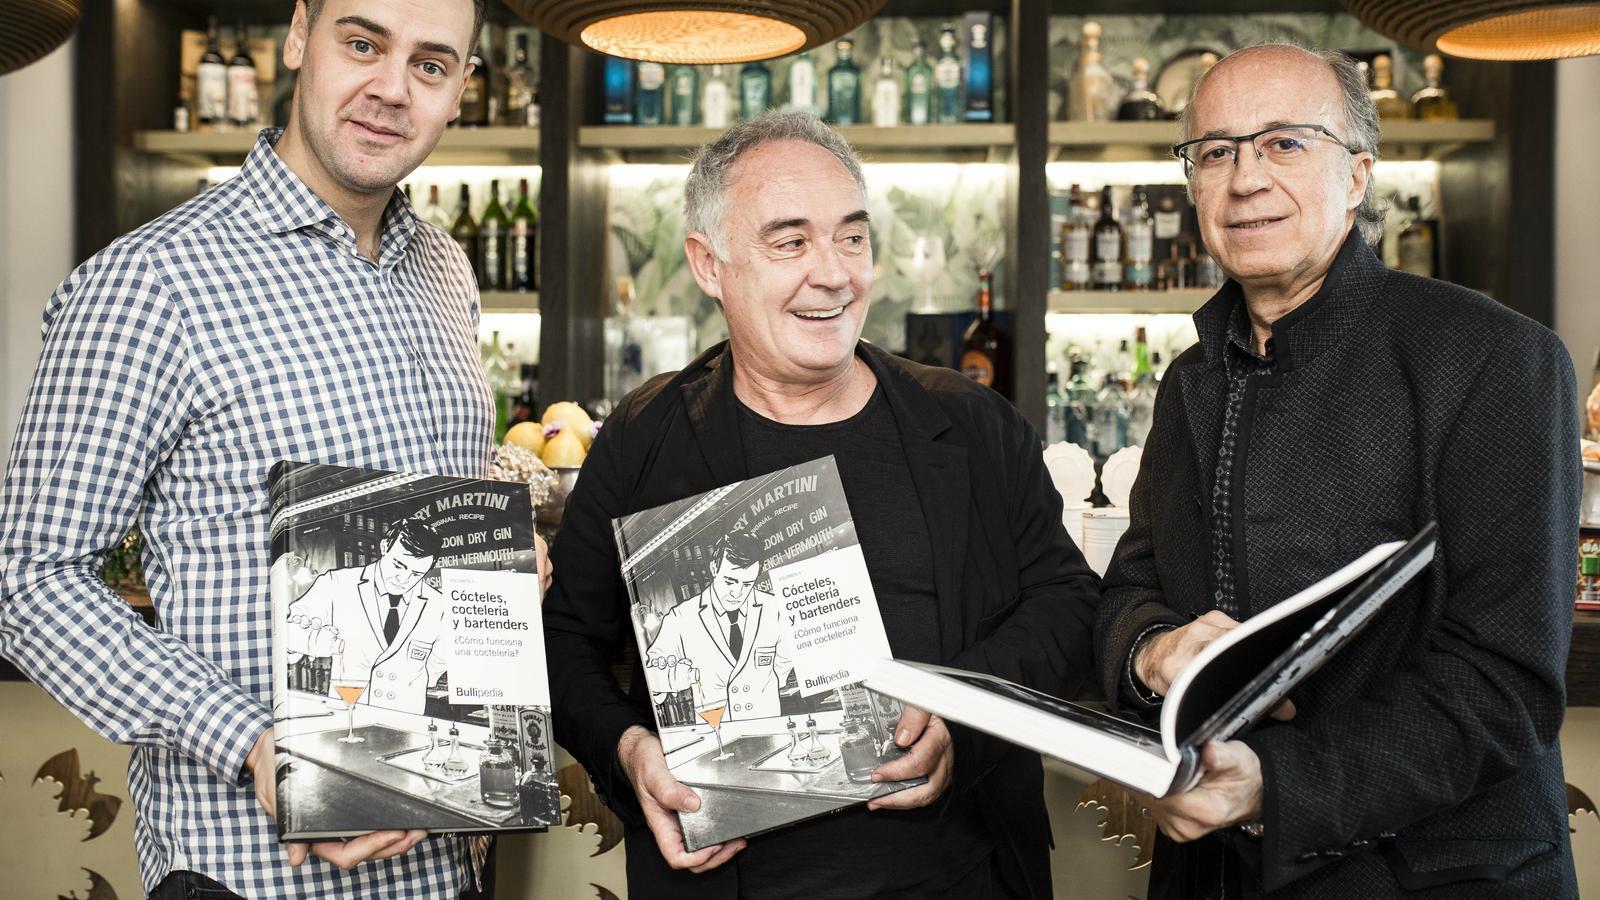 Simone Caporale, Ferran Adrià i Javier de las Muelas durant la presentació